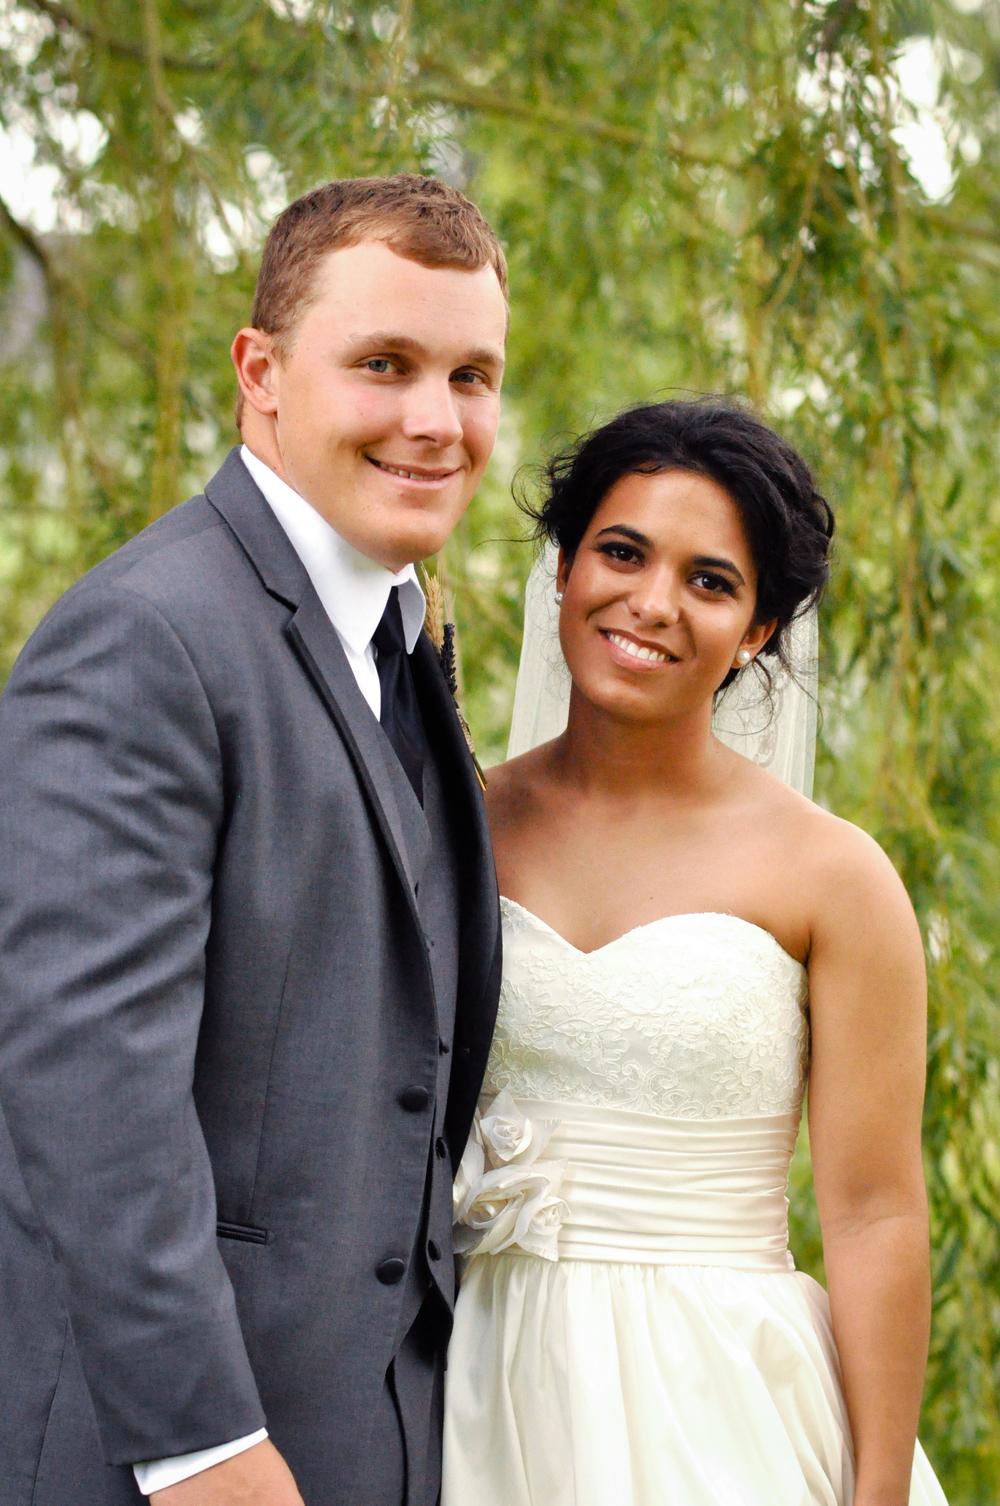 Ryan&Julianna208.jpg